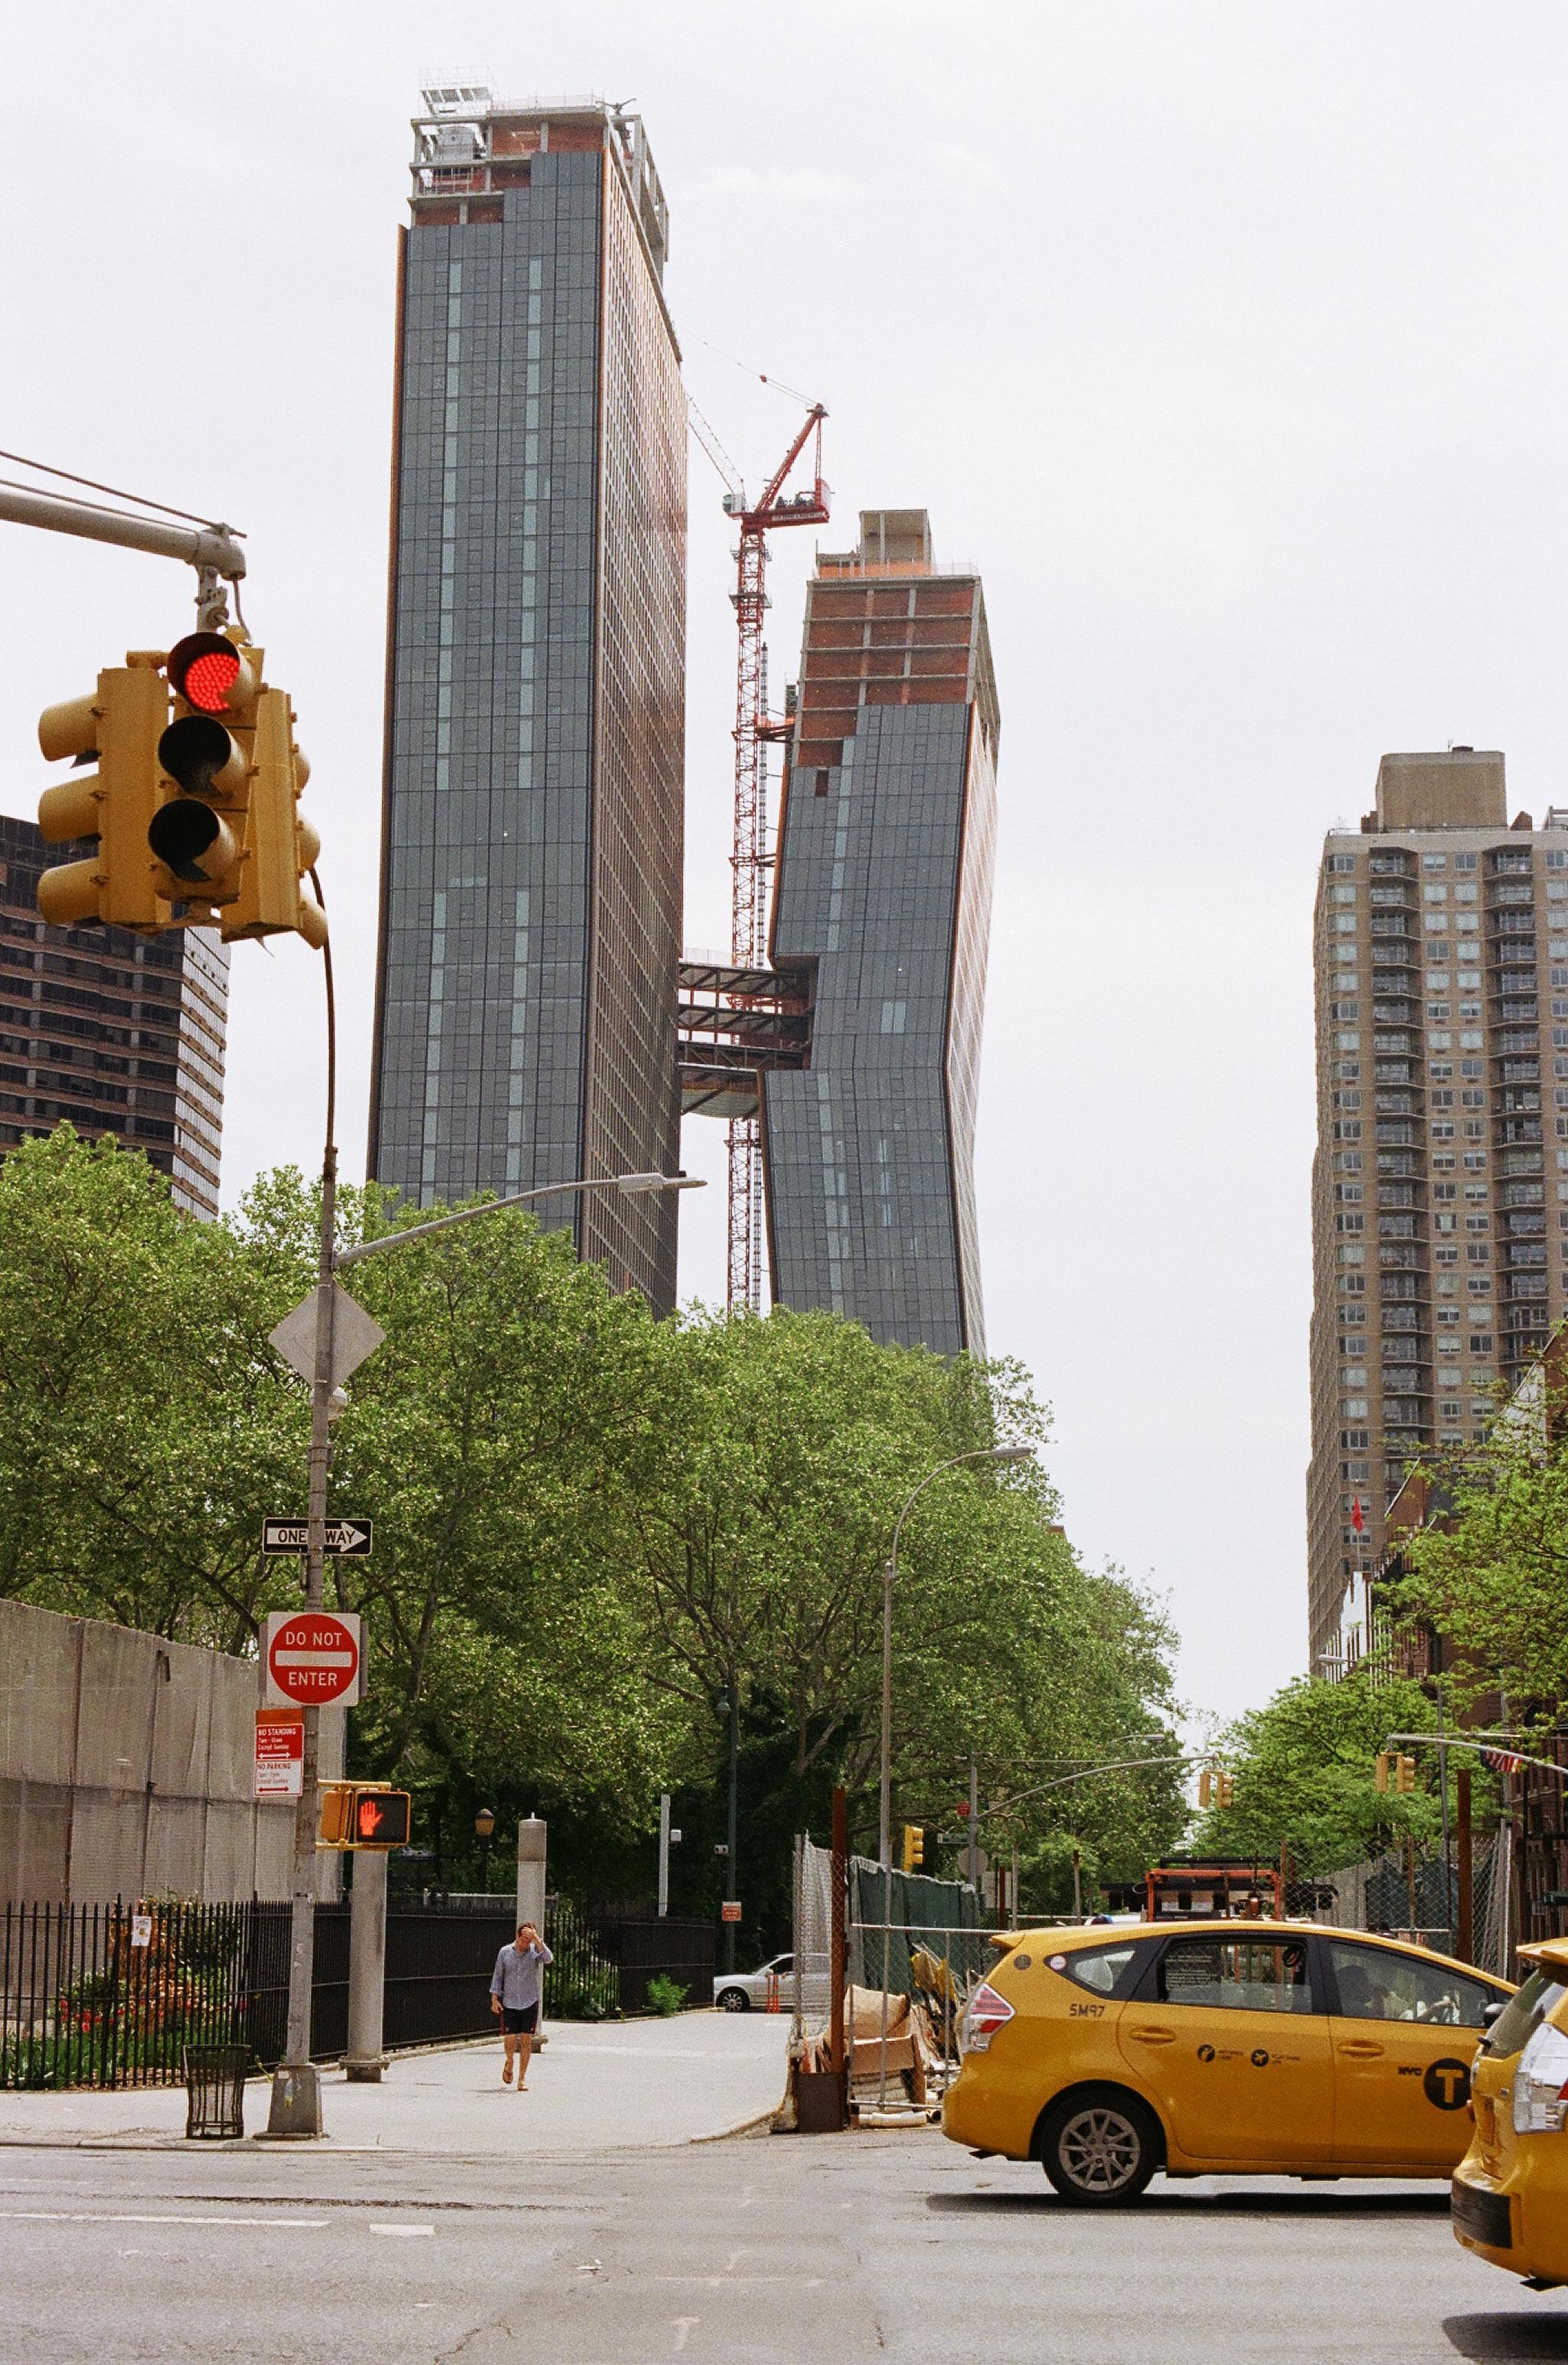 New York, New York, USA   Minolta XD-11